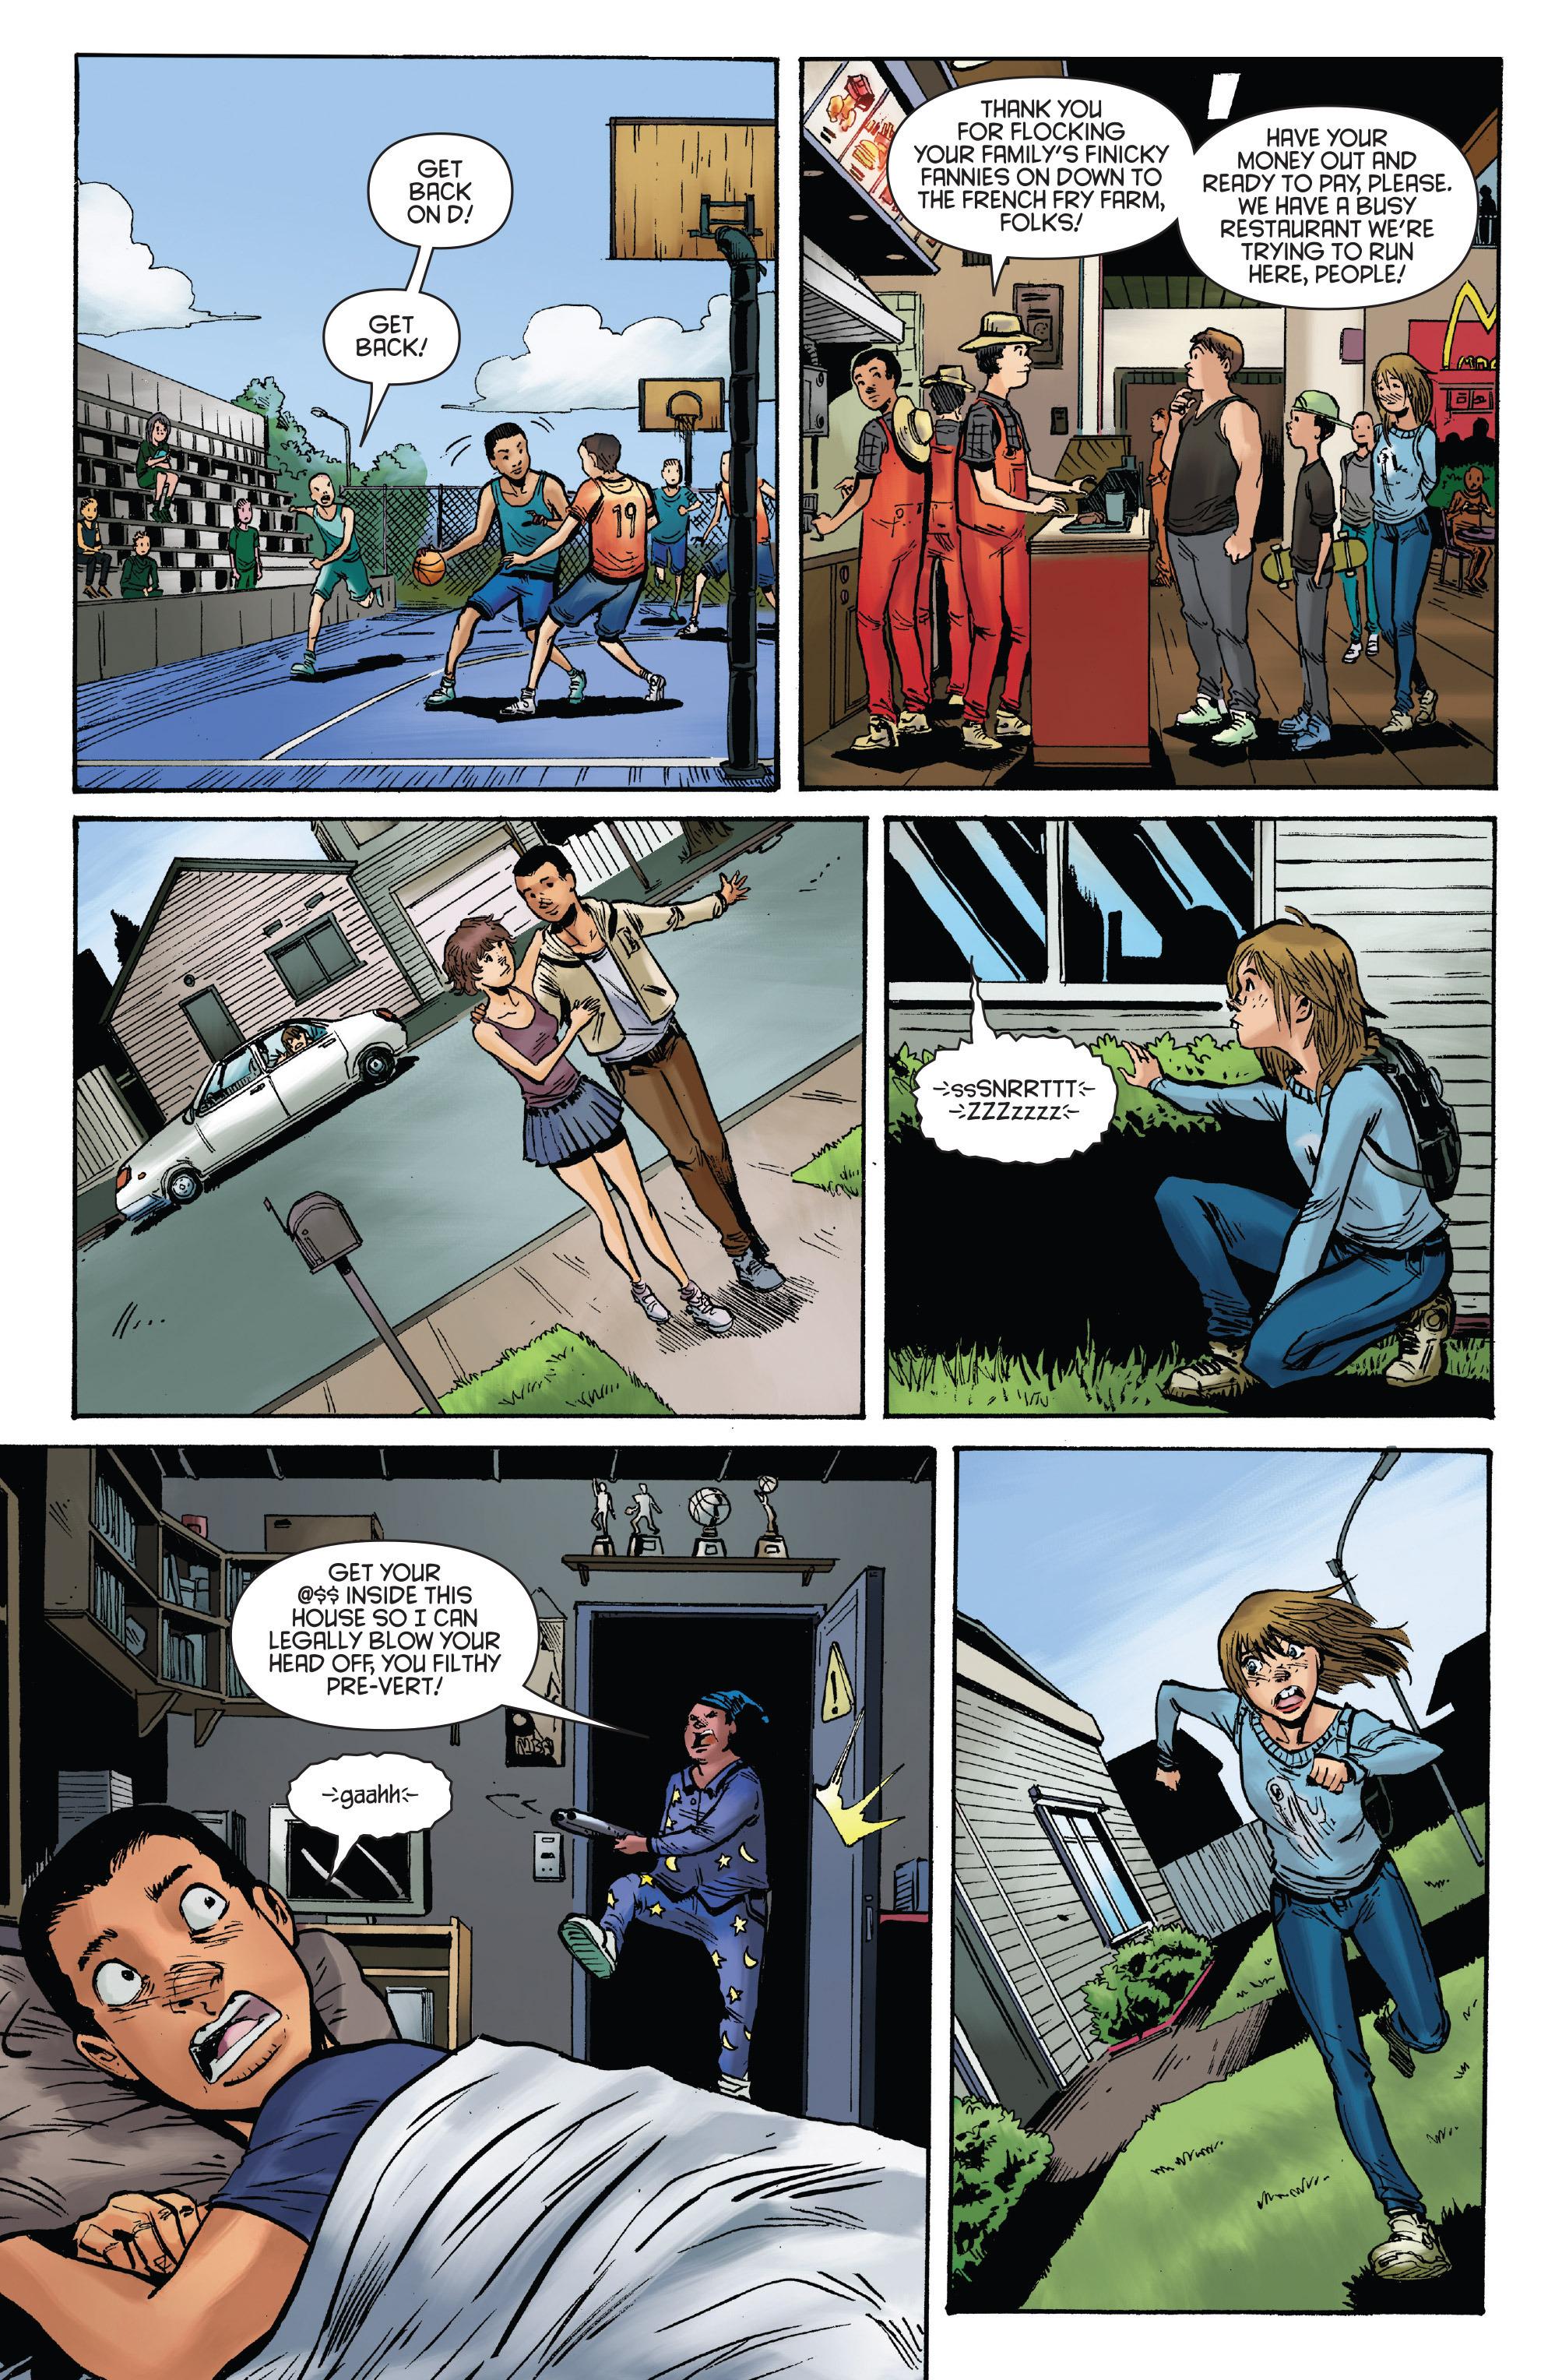 Read online Smosh comic -  Issue #2 - 5